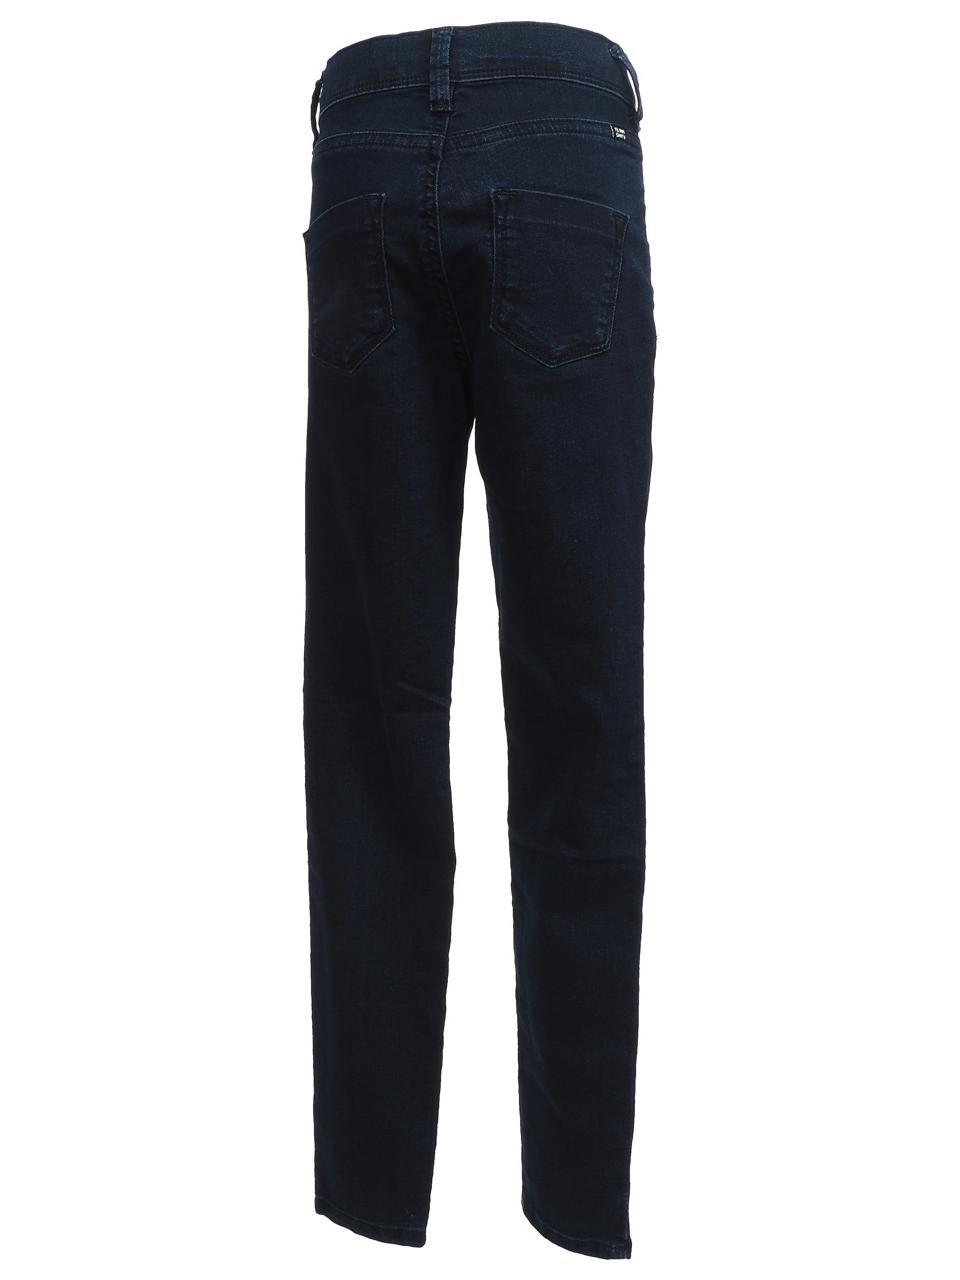 Pantalon-jeans-Teddy-smith-The-jeg-navy-jeans-girl-Bleu-24306-Neuf miniature 5